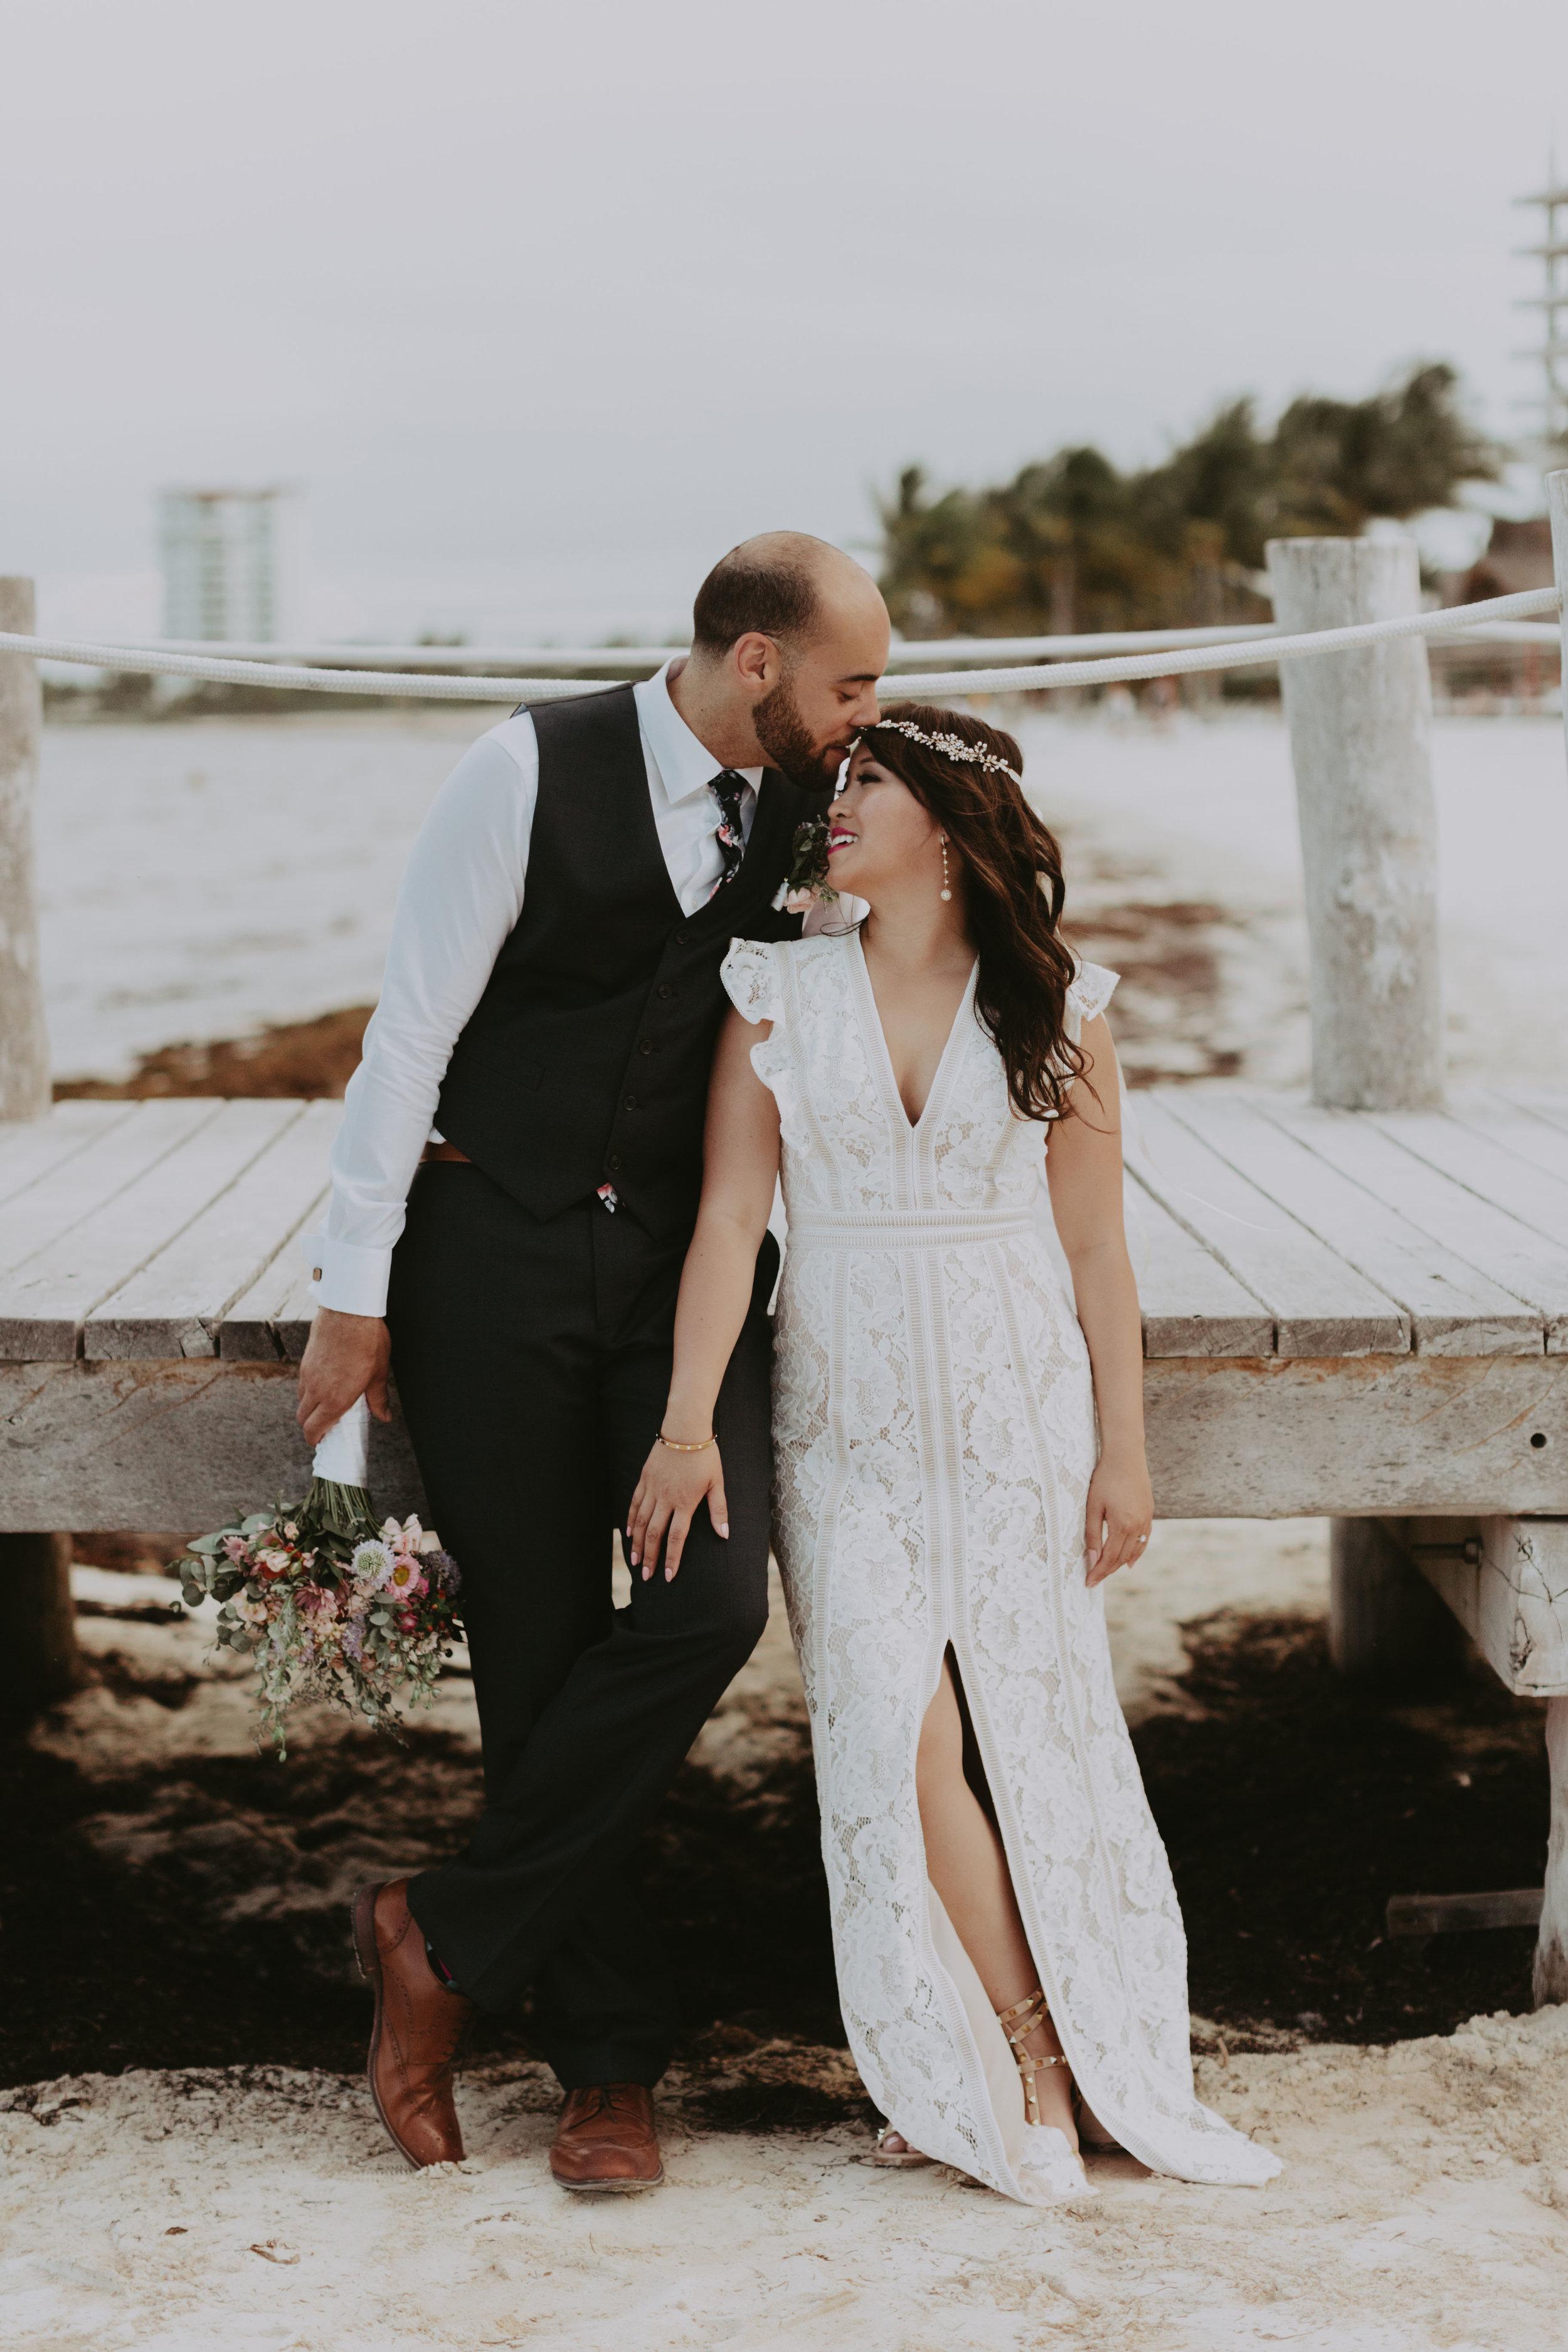 VILLA DEL PALMAR CANCUN WEDDING-THY-BRAN-JENNY CHOK PHOTOIMG_5369.jpg